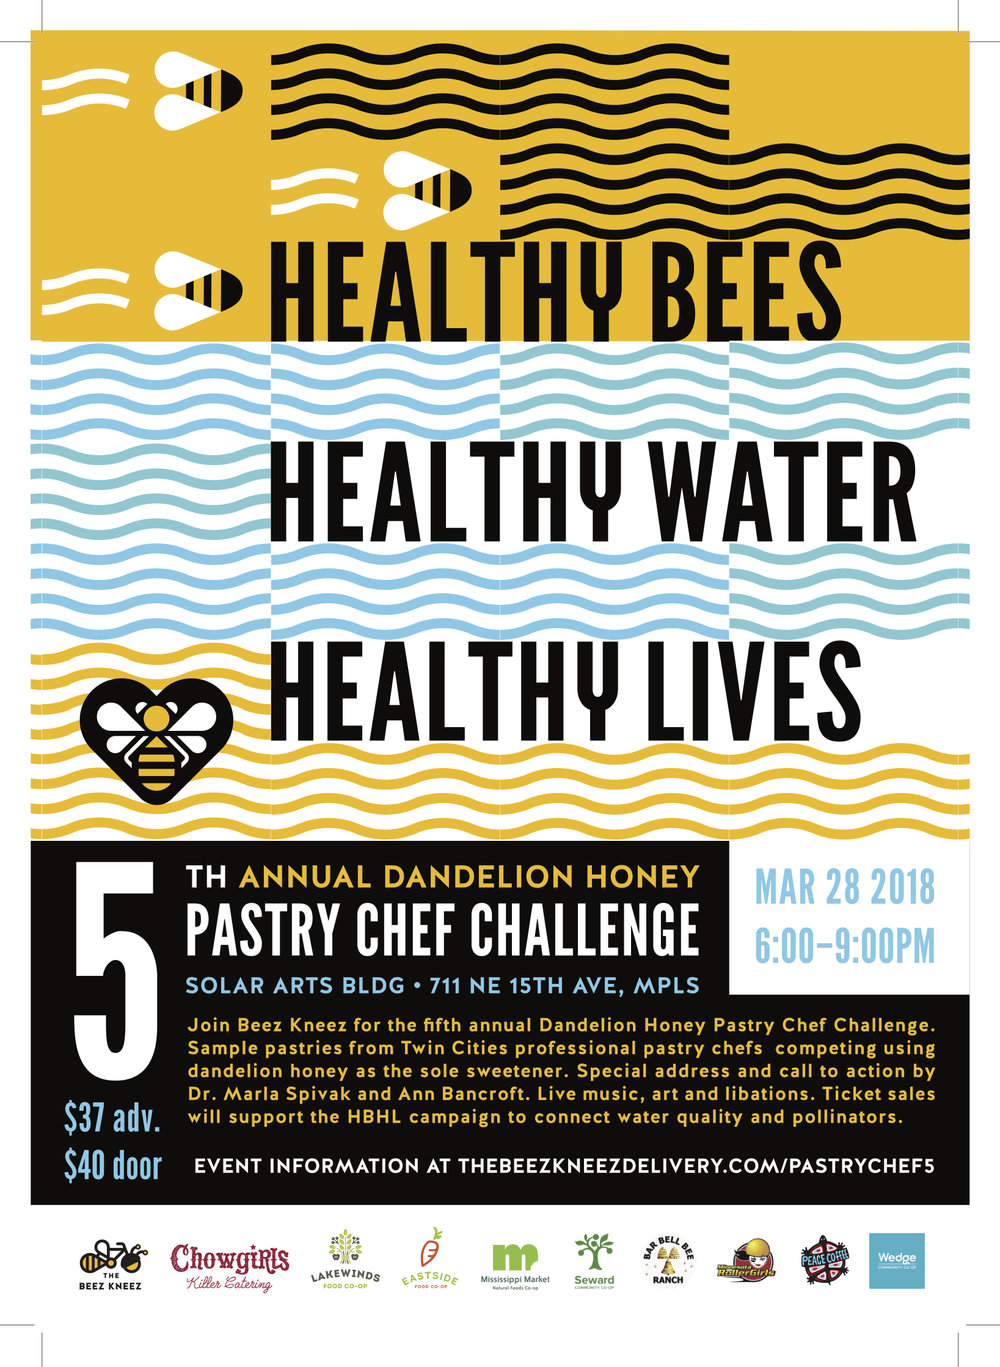 Pastry Chef Challenge 2018-10x14 jpeg.jpg